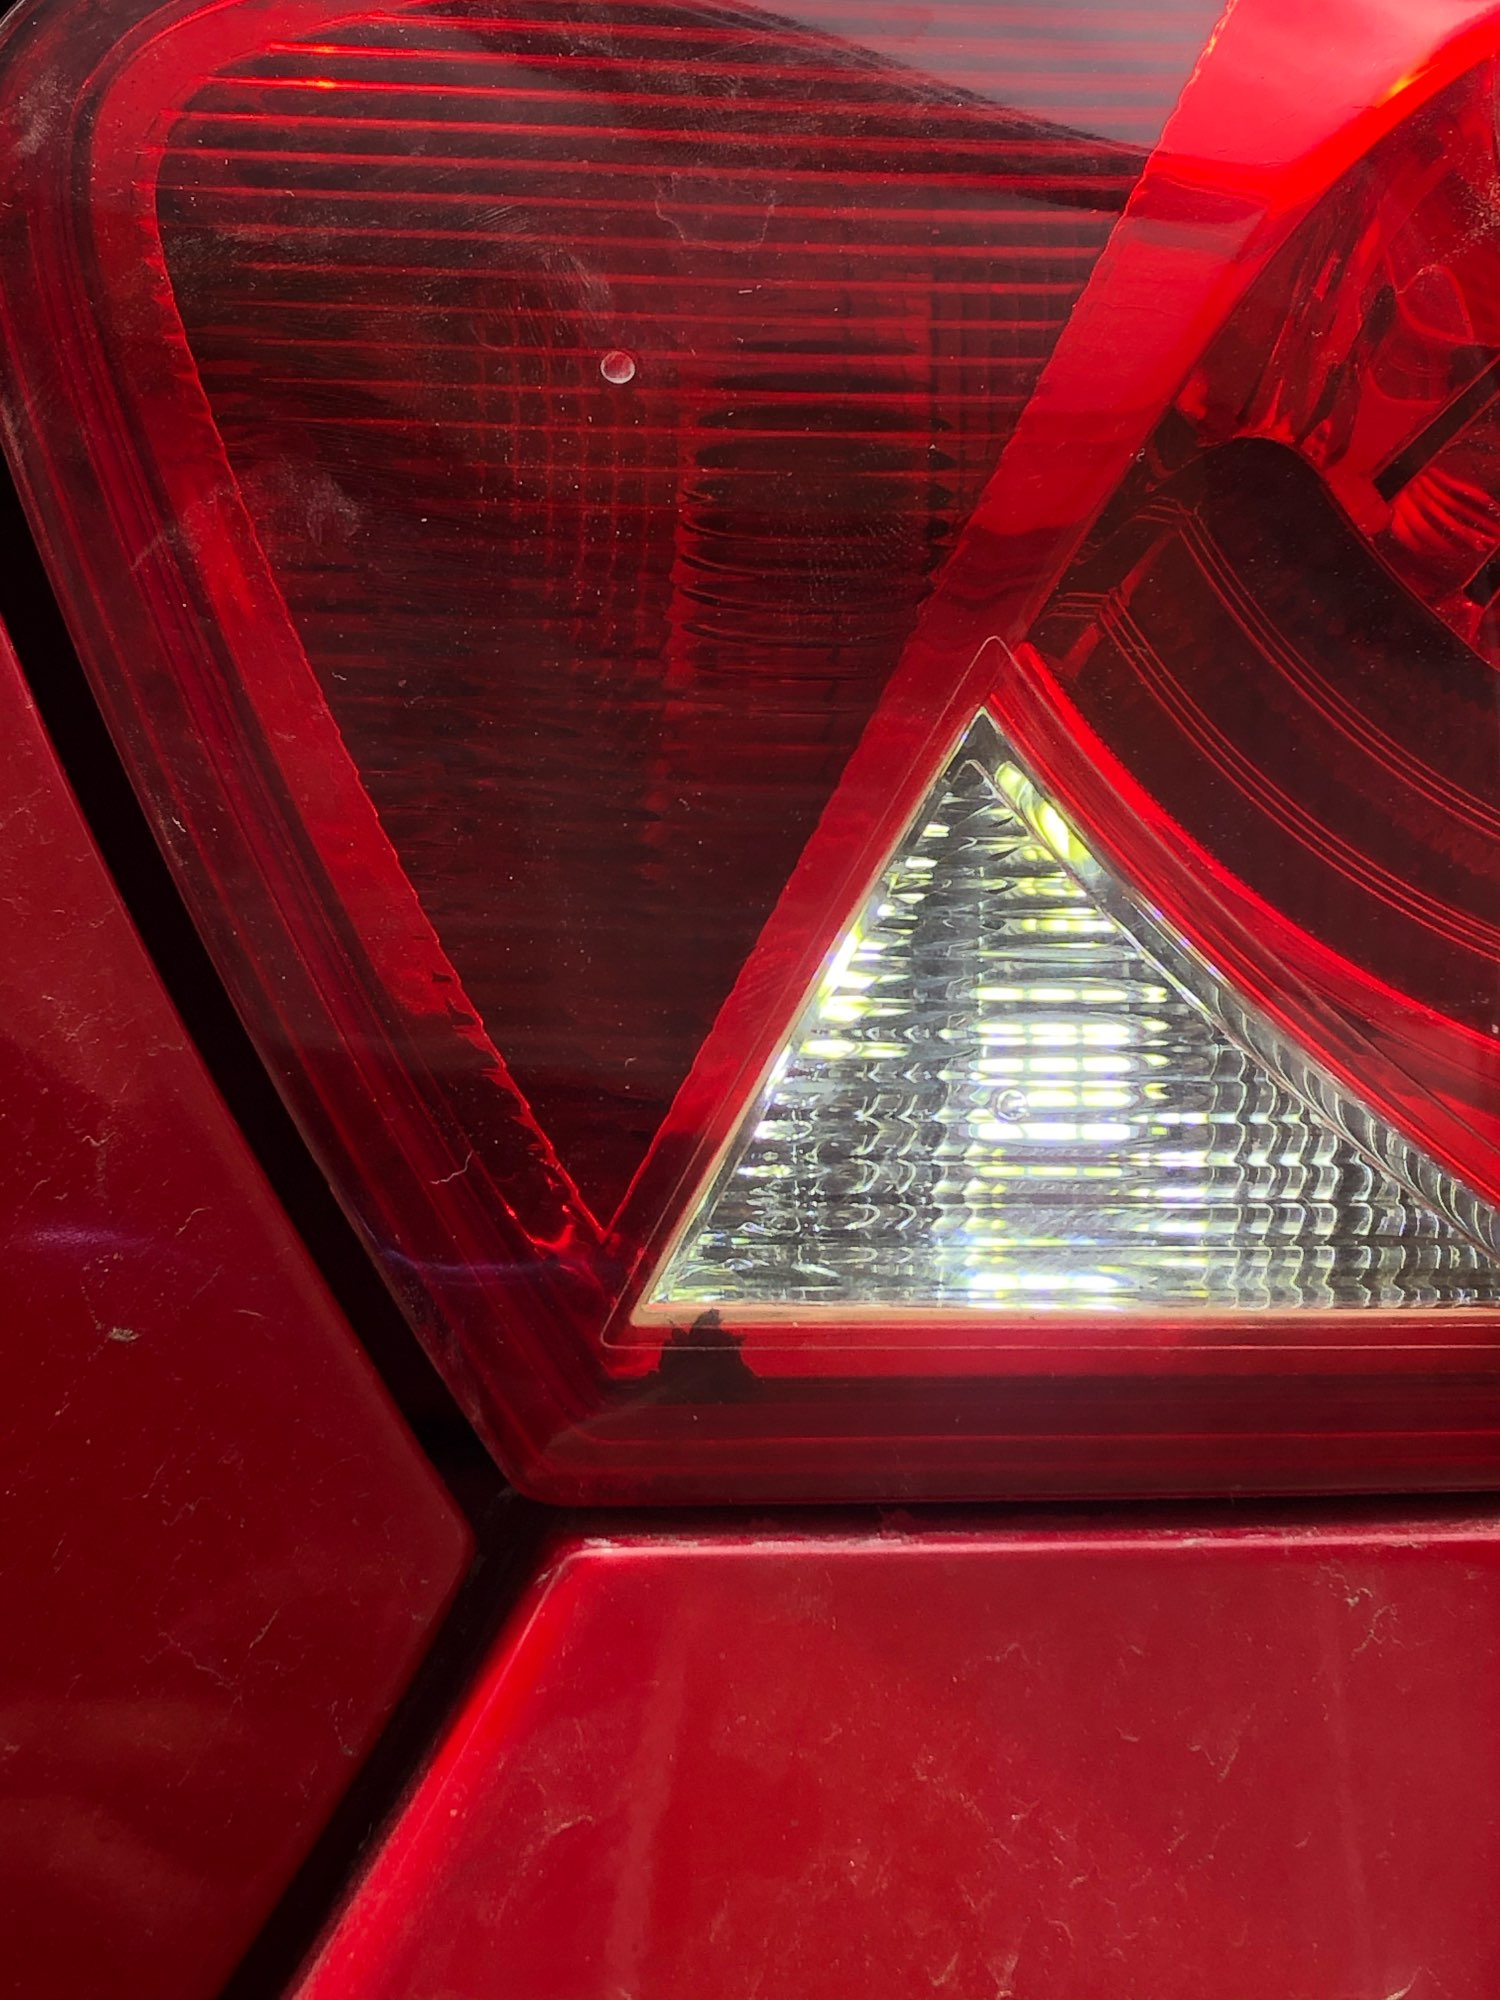 Uds 1156 BA15S P21W 1157 P21/5W BAY15D BAU15S PY21W LED Bombilla trasera de coche luces de freno reverso lámpara diurna luz de s